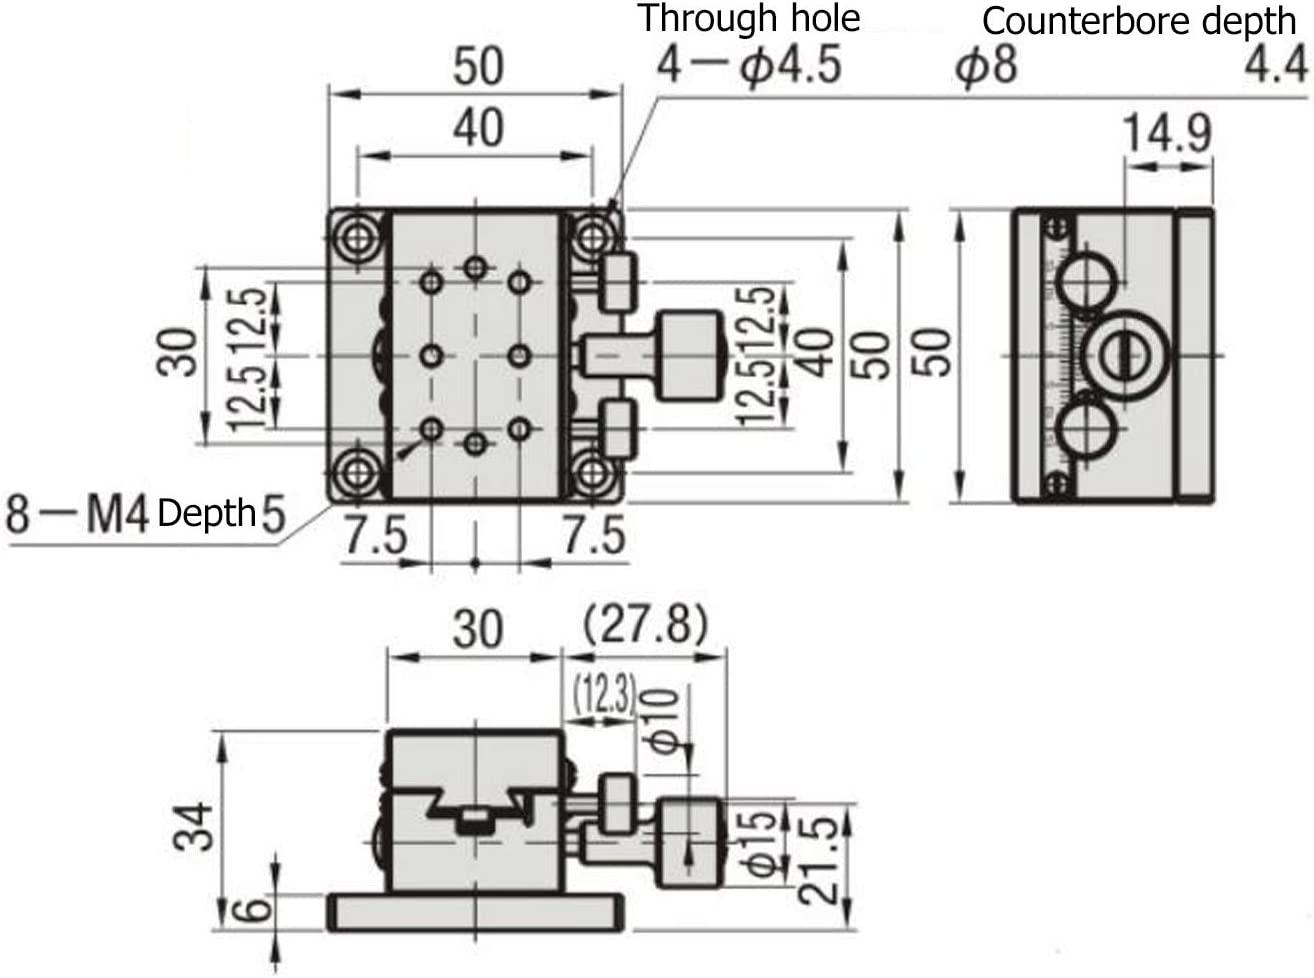 Etapa lineal manual del eje X Etapa de traslaci/ón lineal Manual Mesa deslizante de pi/ñ/ón lineal X 30 x 50 mm SEMCIC-50 Mesa deslizante tipo pi/ñ/ón de cremallera X